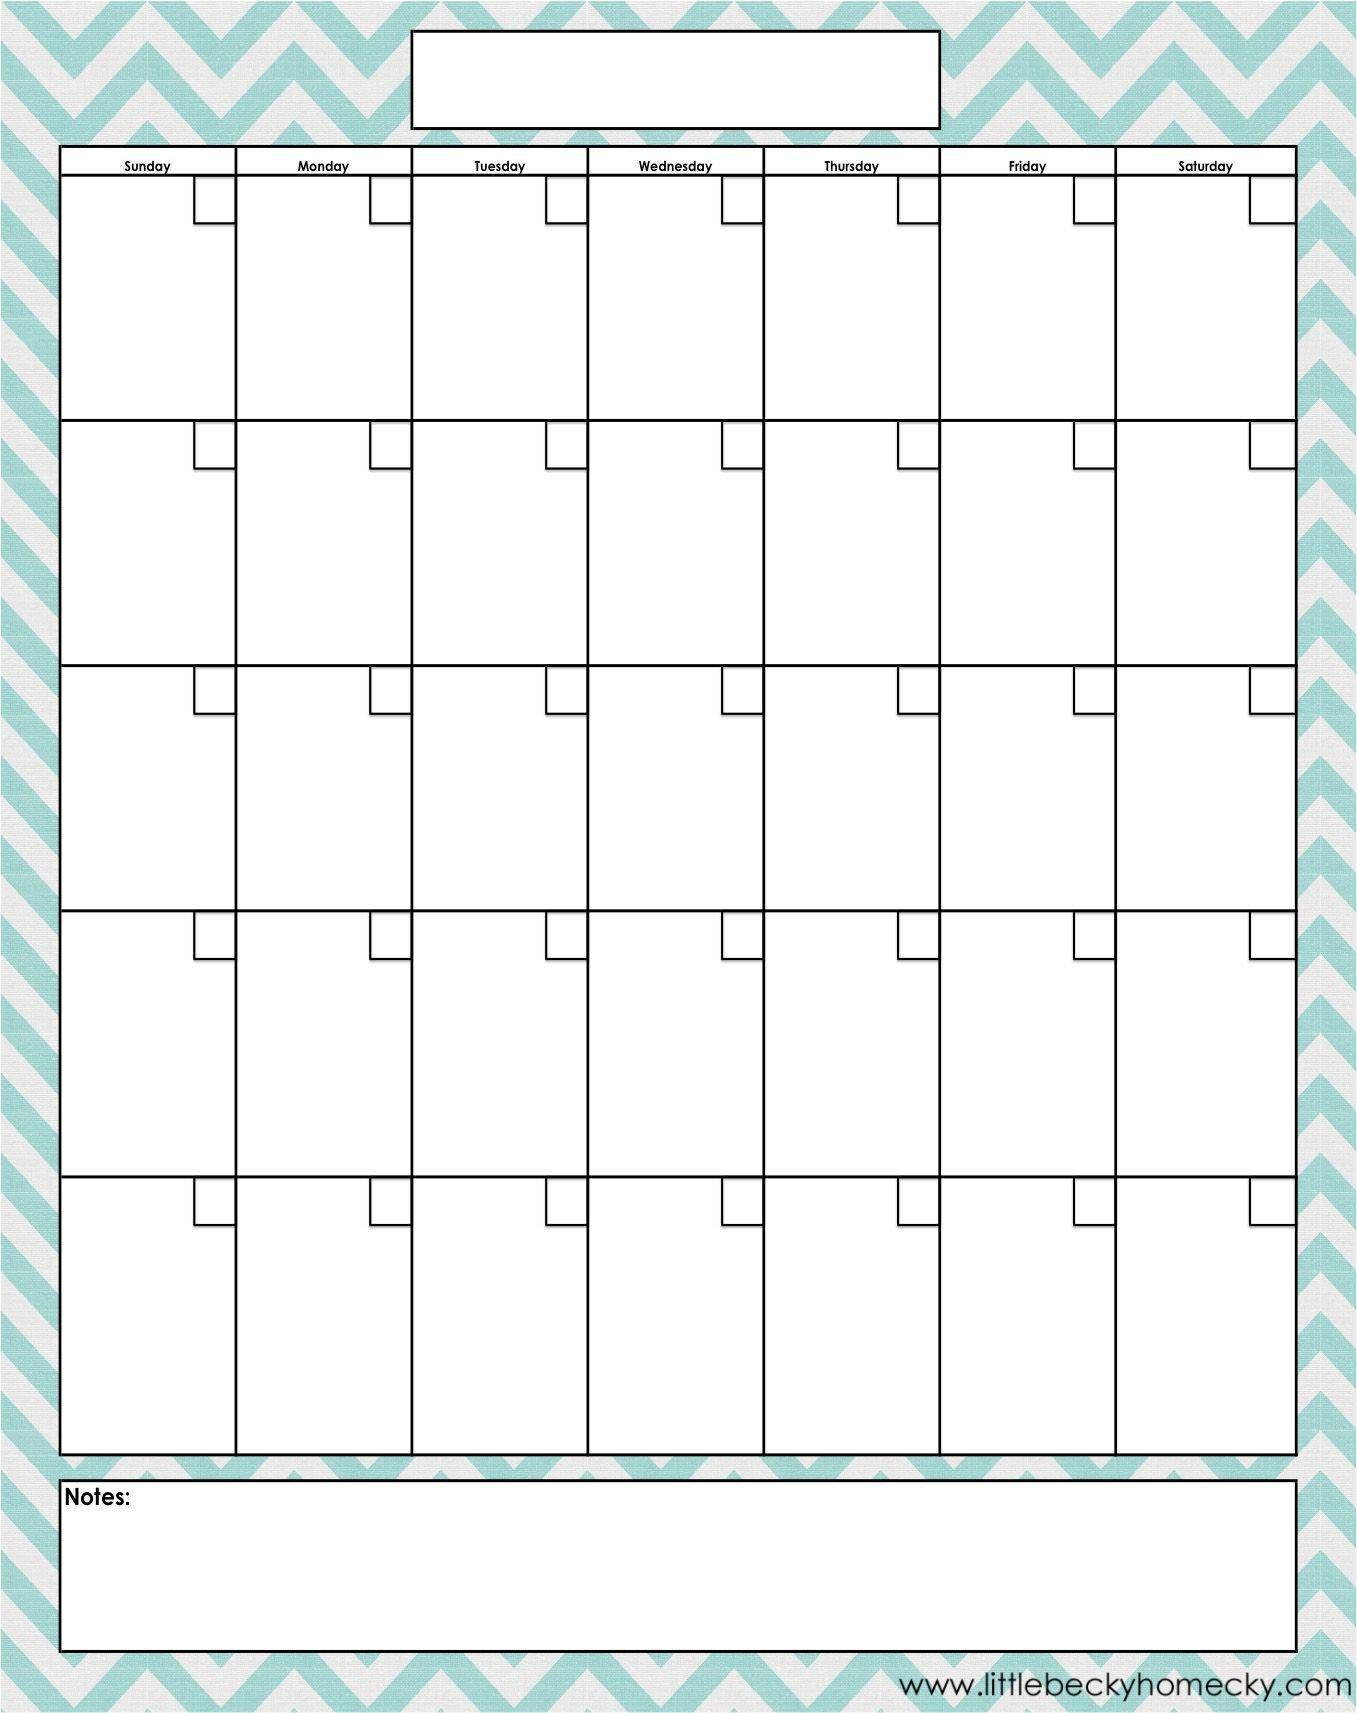 Blank Fill In Calendar   Calendar Template Printable Blank Calendar To Fill